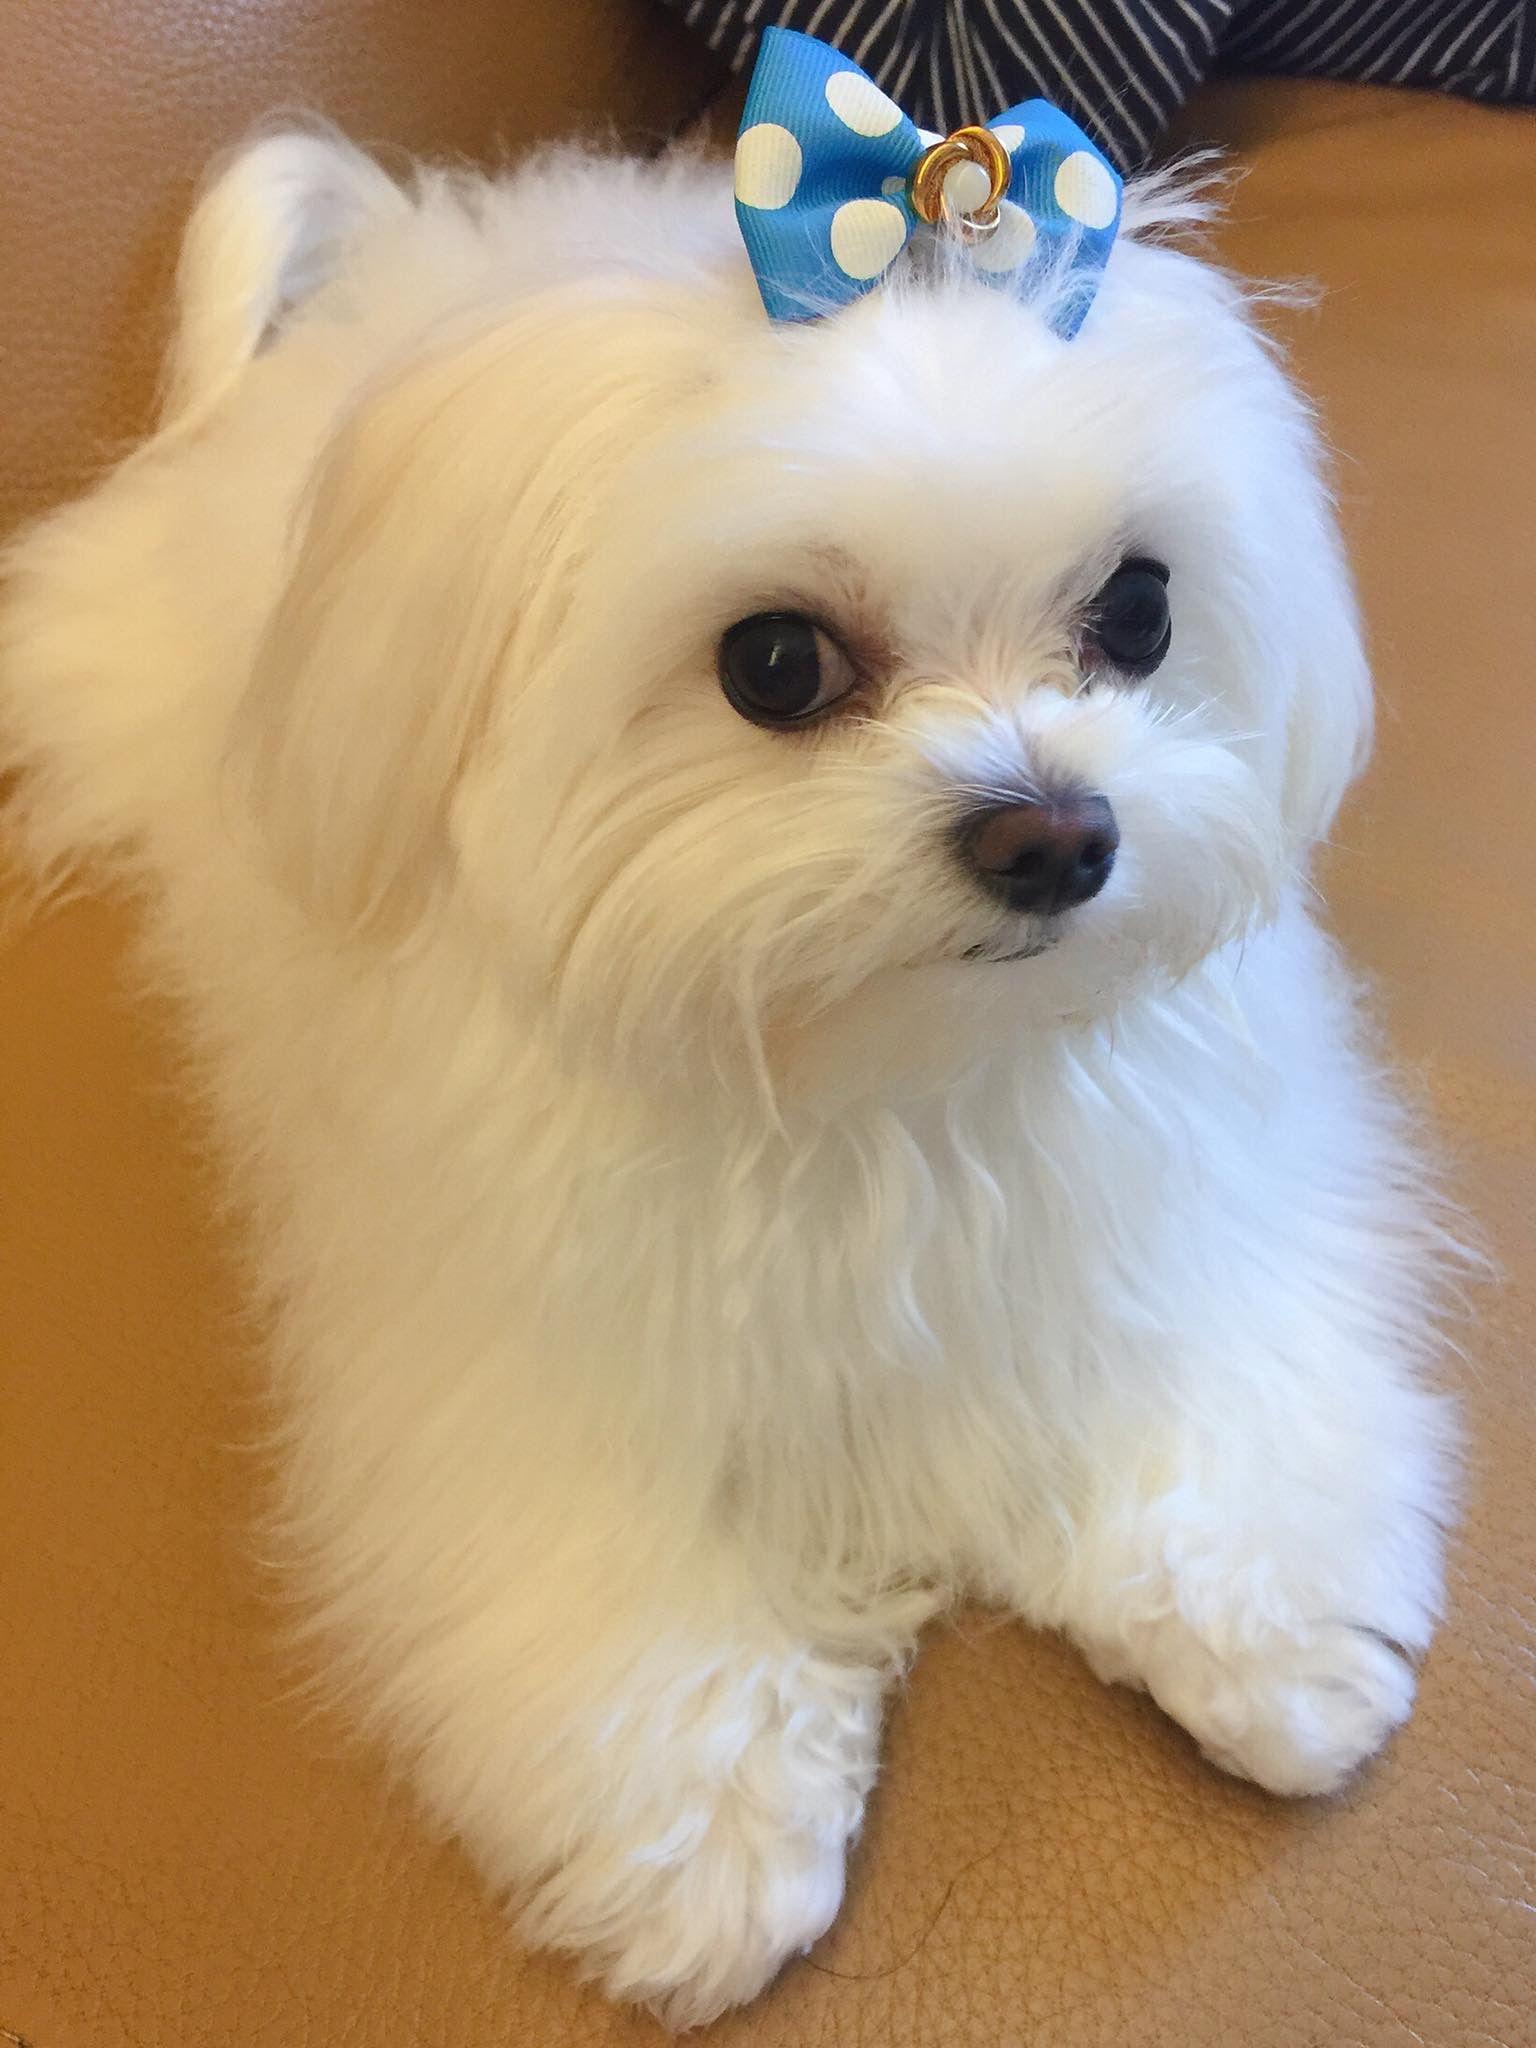 It S So Cute Maltese Dog Breed Maltese Puppy Cute Puppies